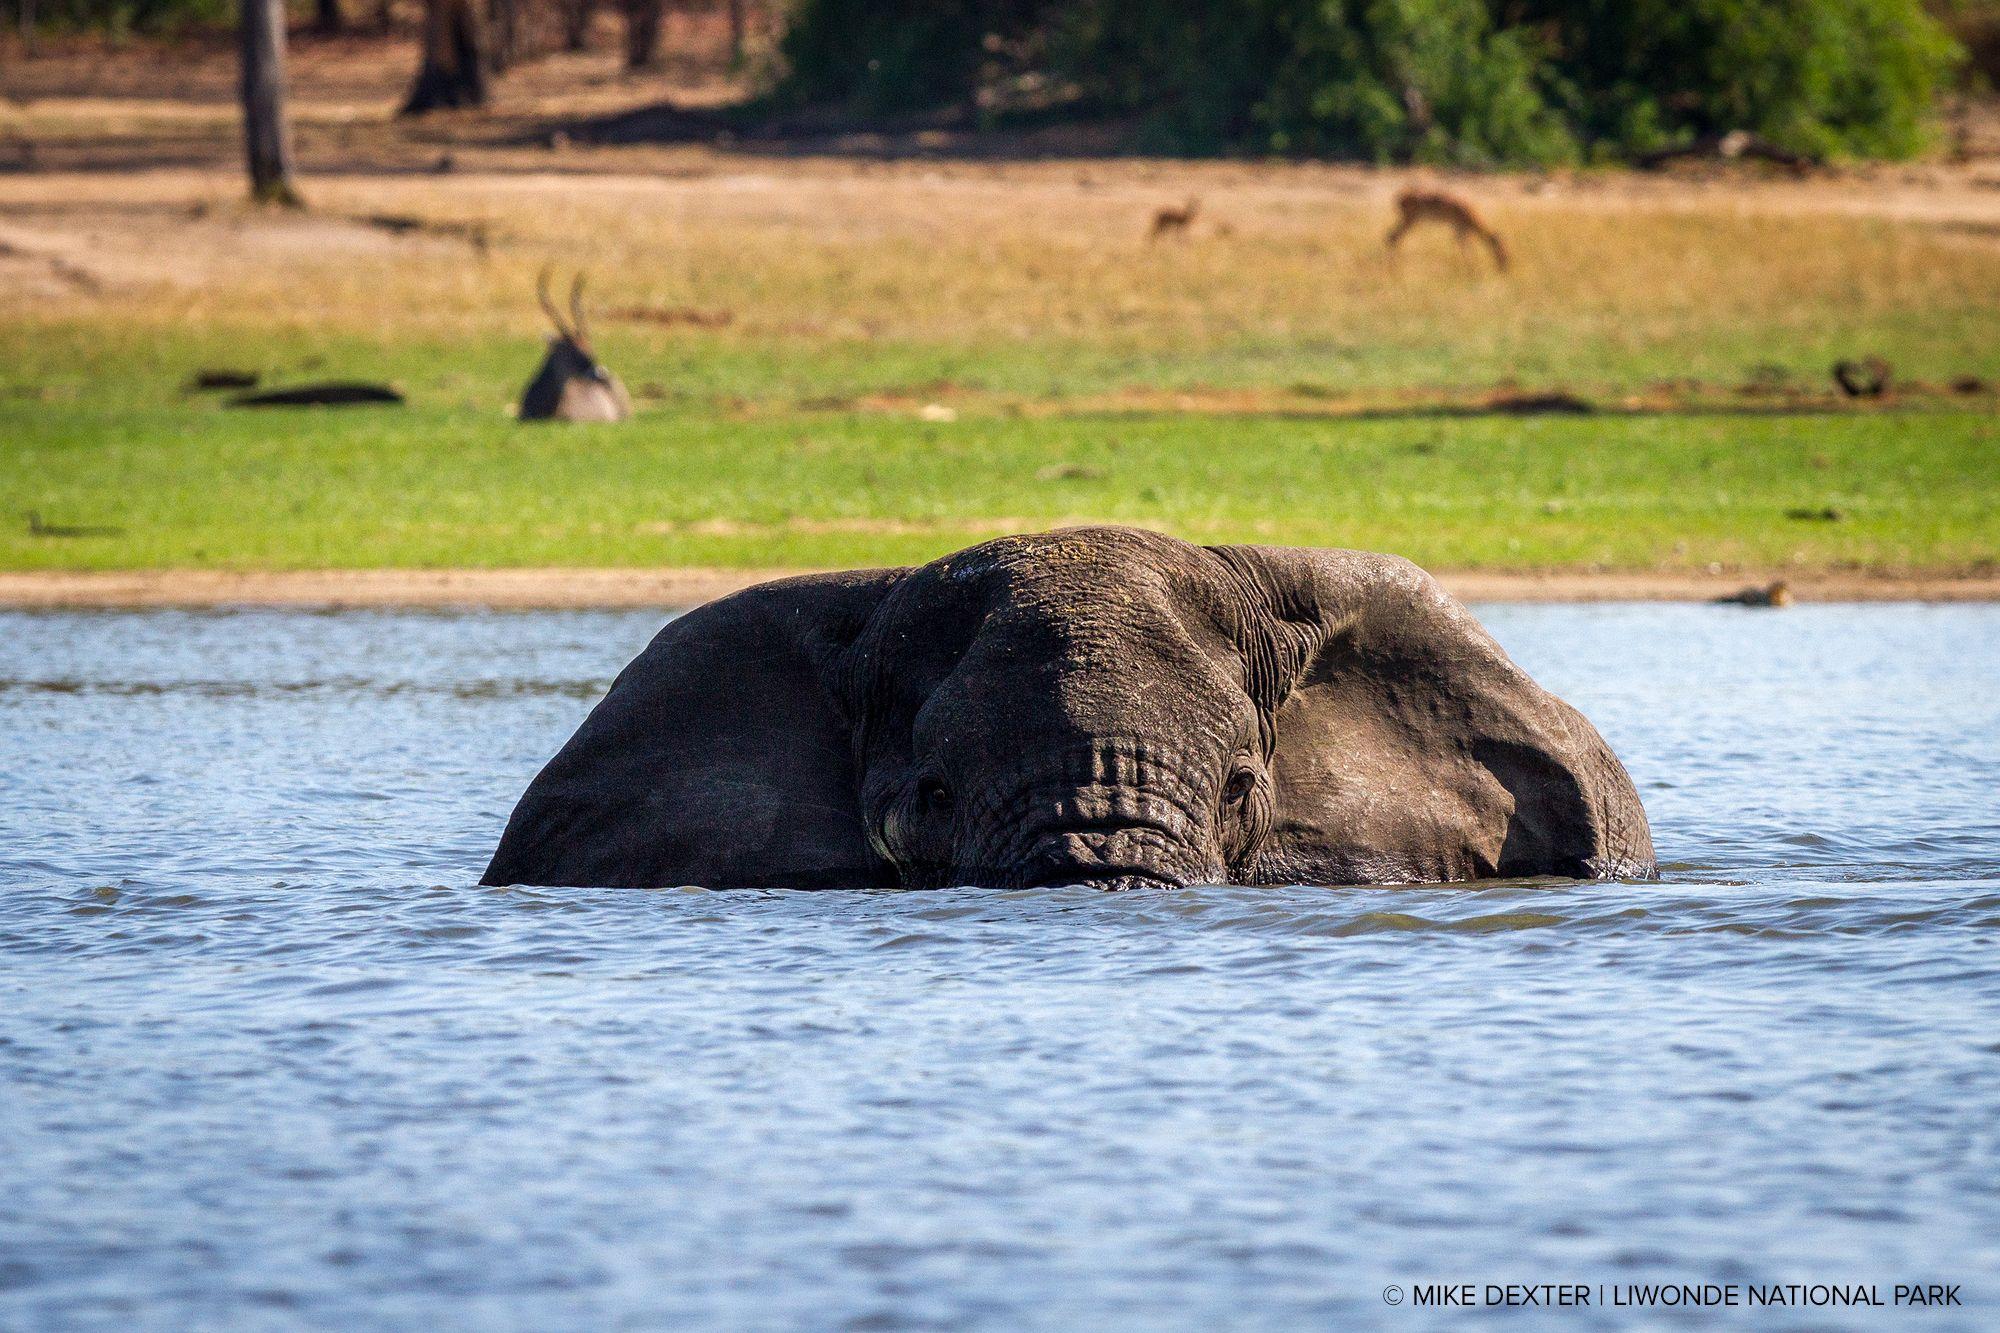 Elephant bathing at a park in Malawi.